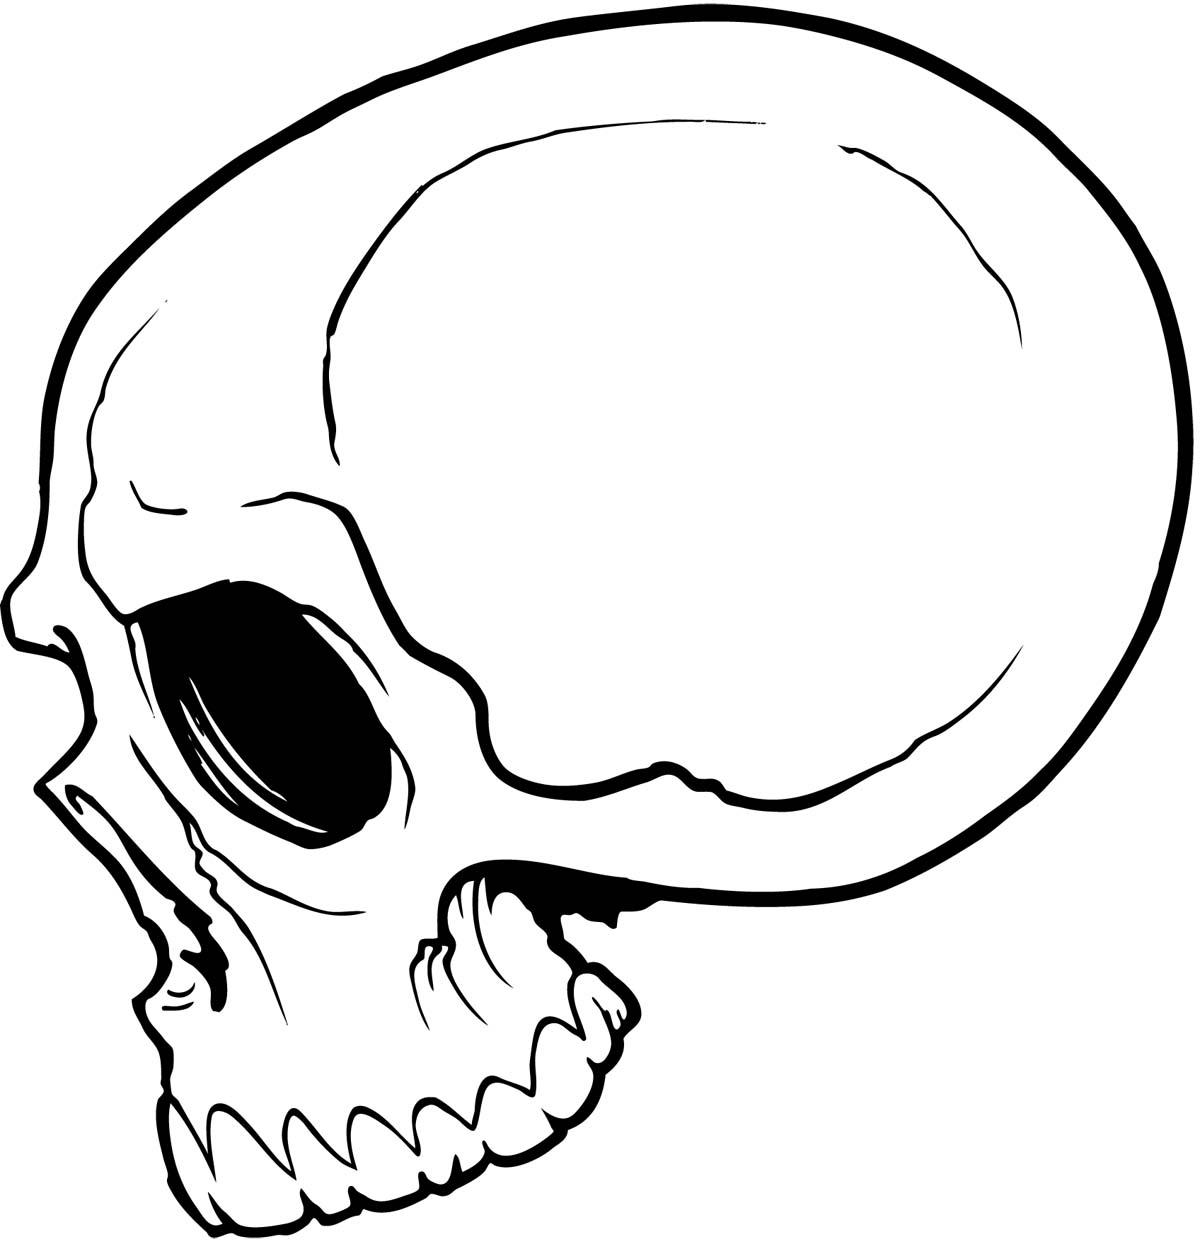 Line Art Skull : Line drawing of a skull clipart best